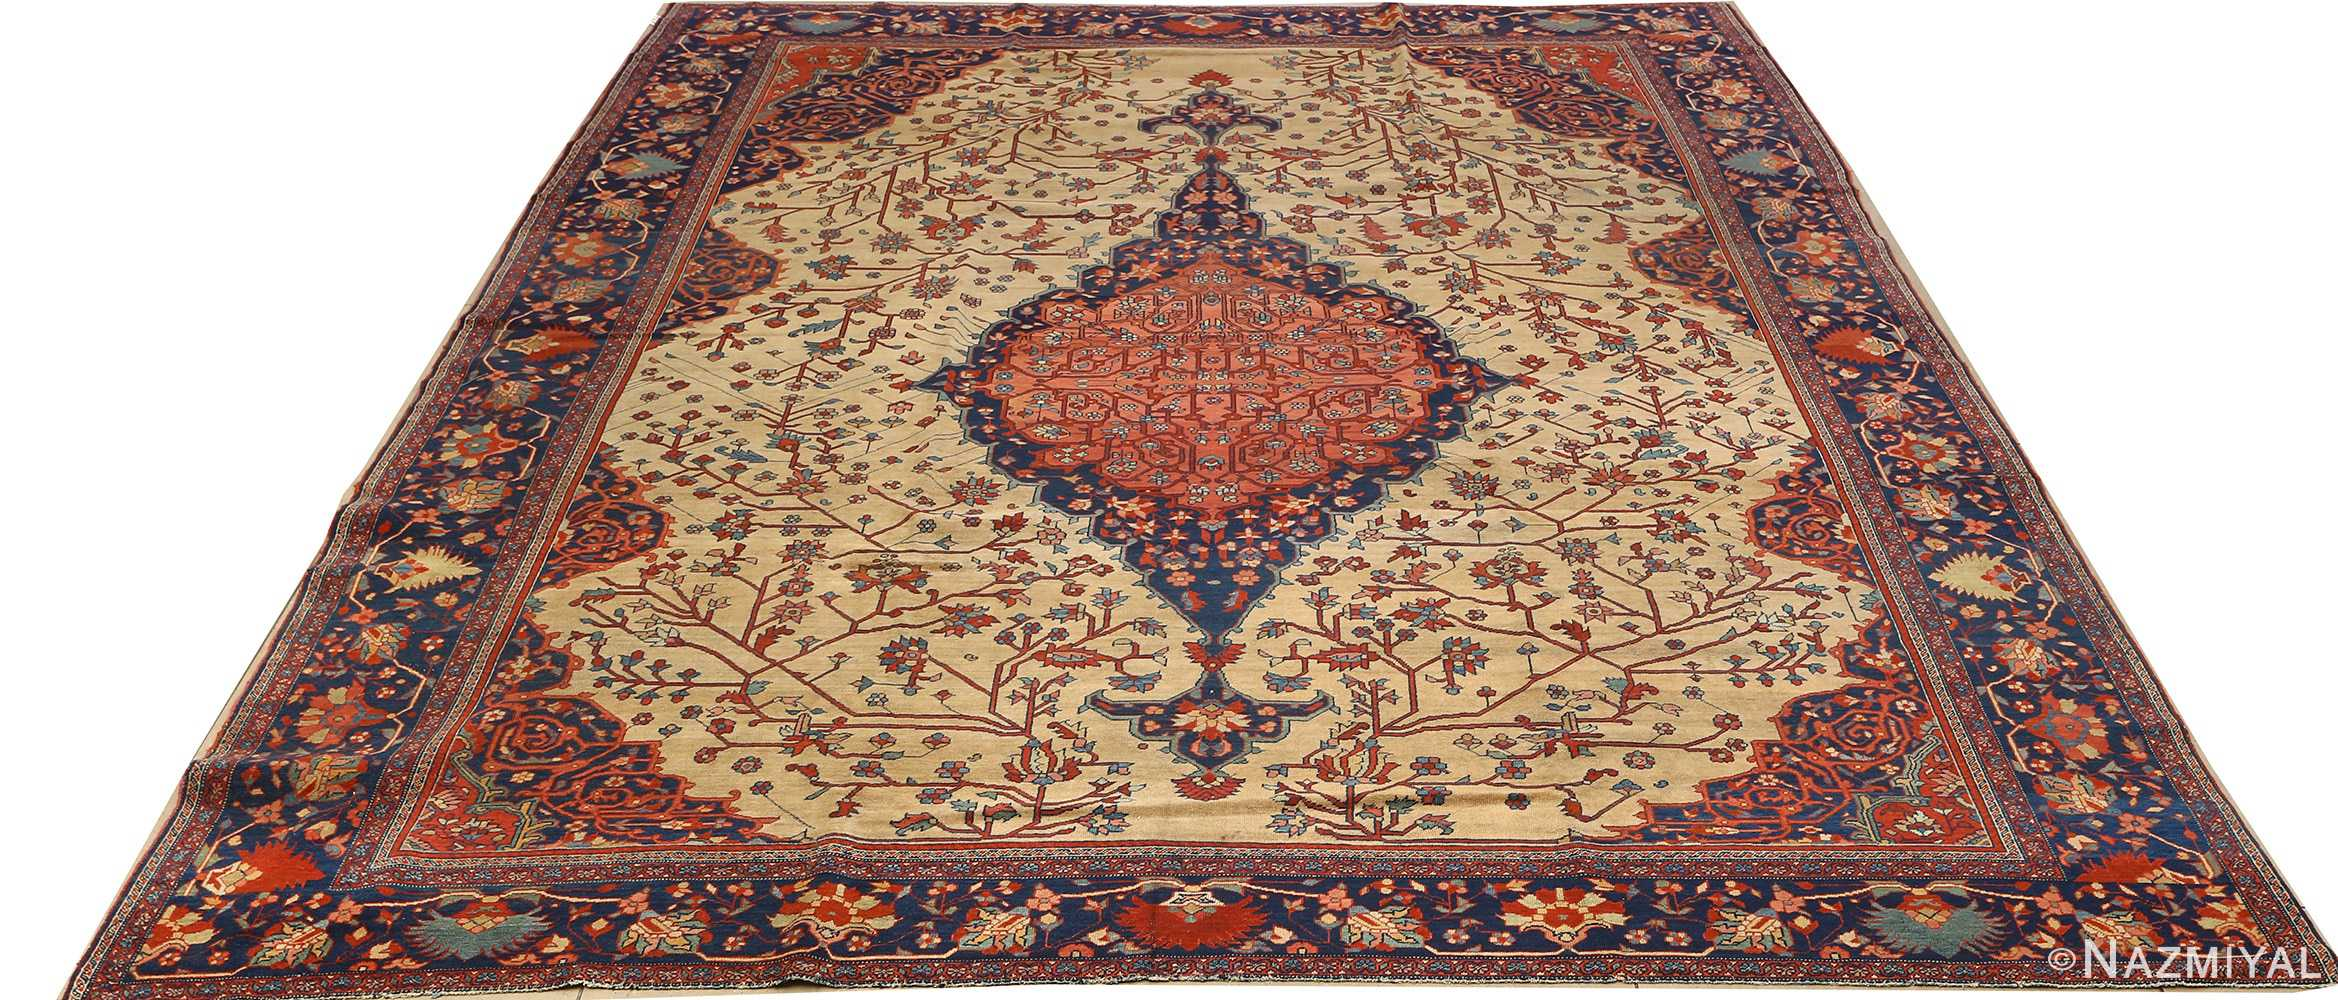 antique ivory background sarouk farhan persian rug 51094 full Nazmiyal